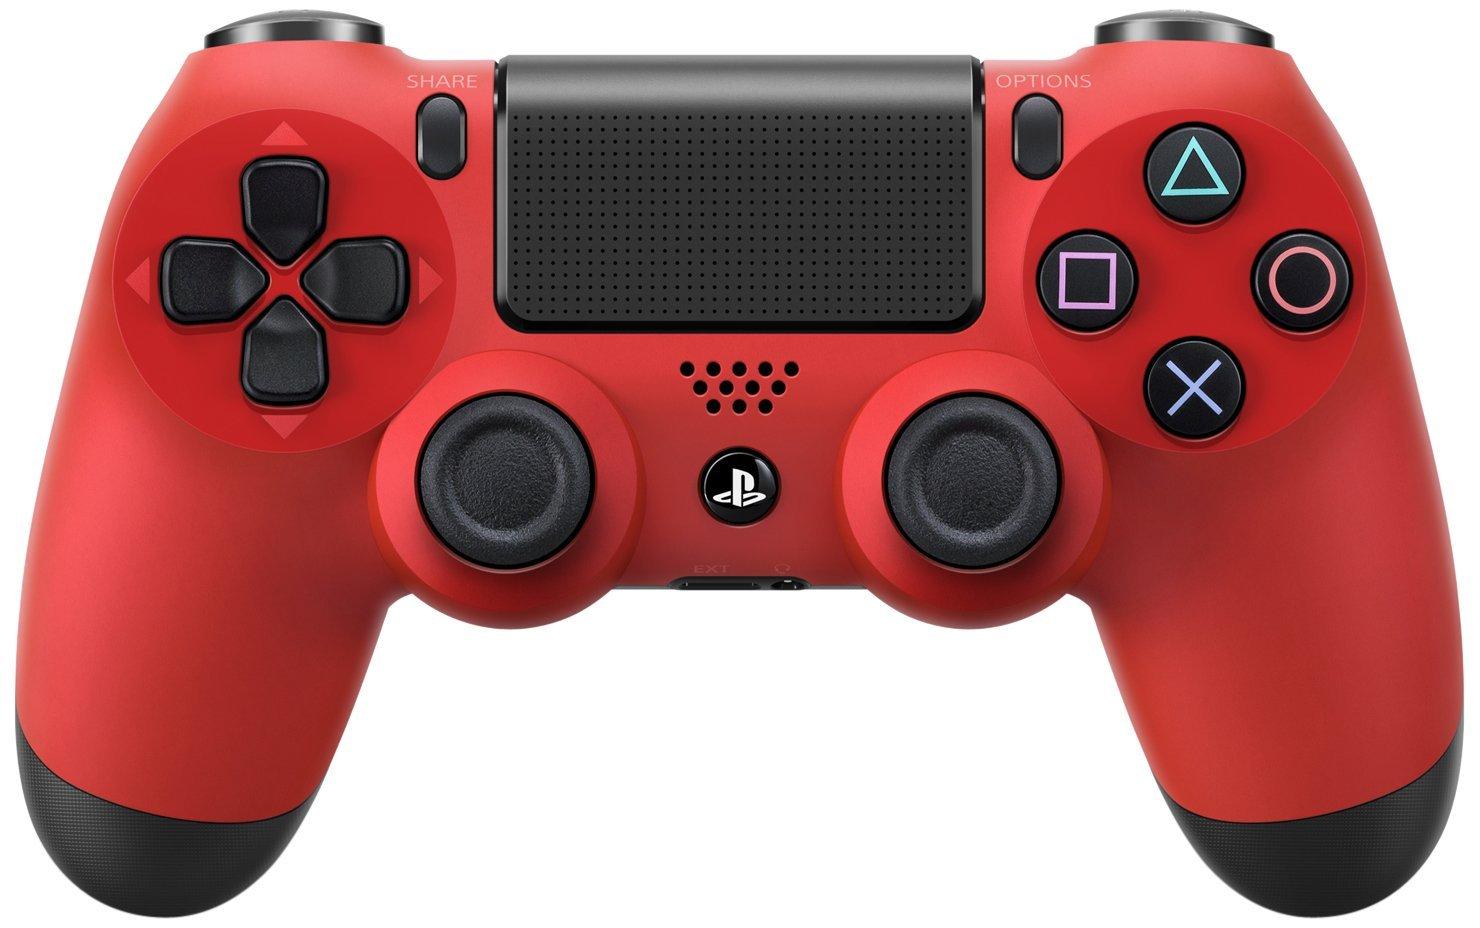 Геймпад беспроводной Sony Dualshock 4 [PS4] (Magma Red)